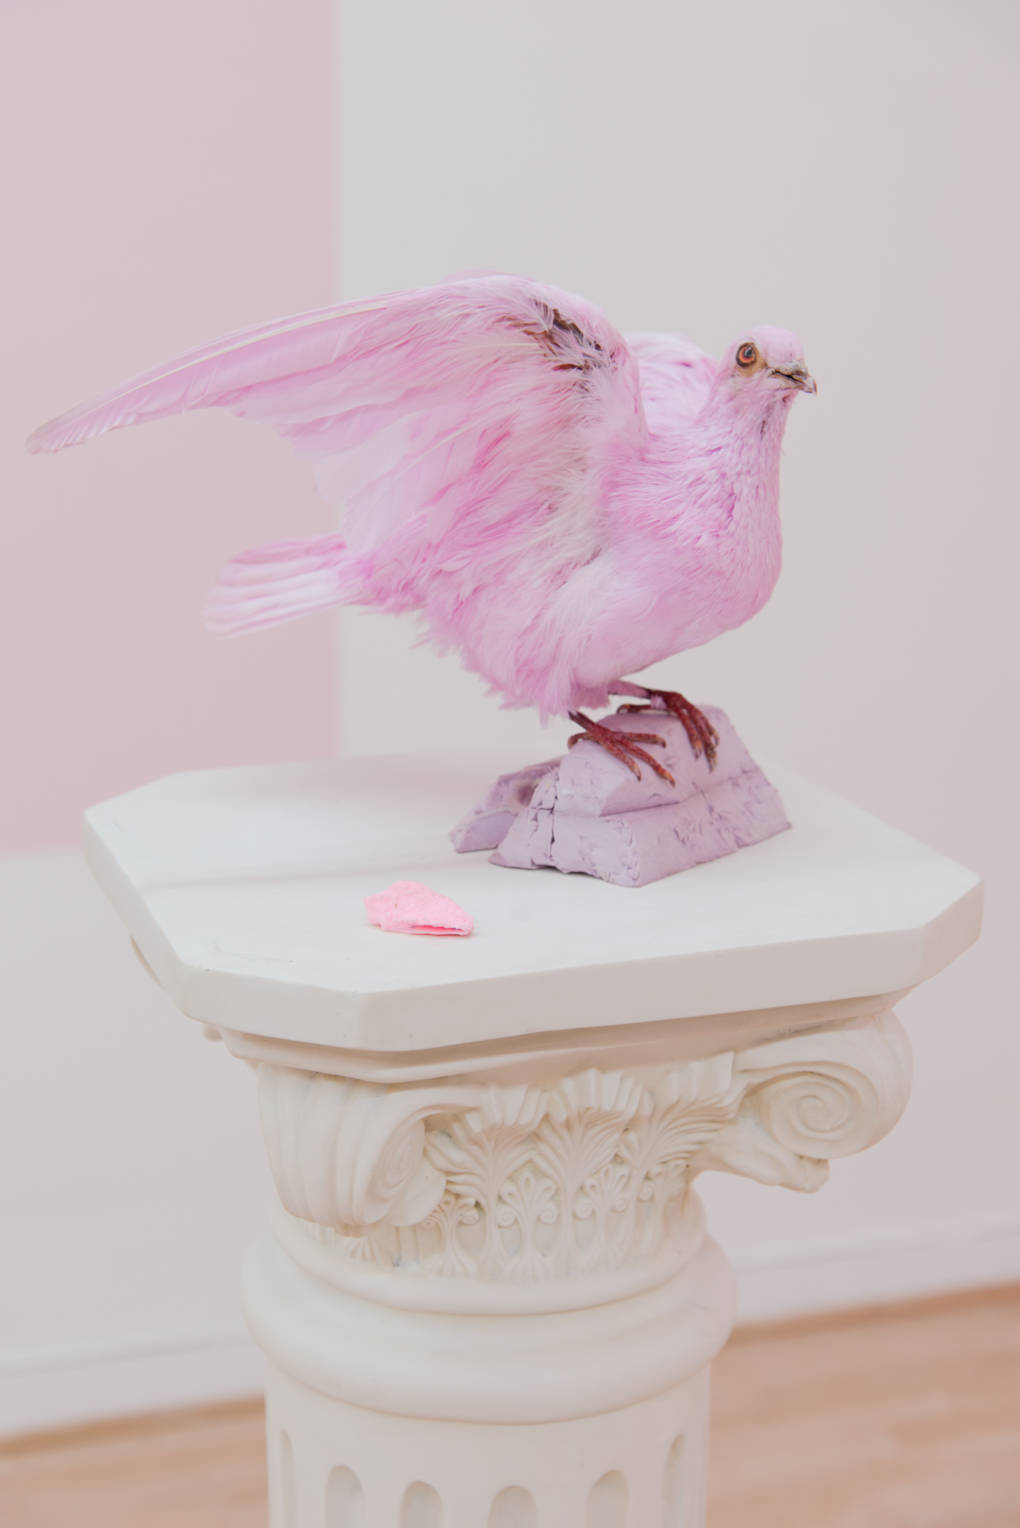 Sofía Córdova, 'Dame la mano paloma, para subira tu nido (Give me your hand, dove, so that I may climb into your nest),' 2017.